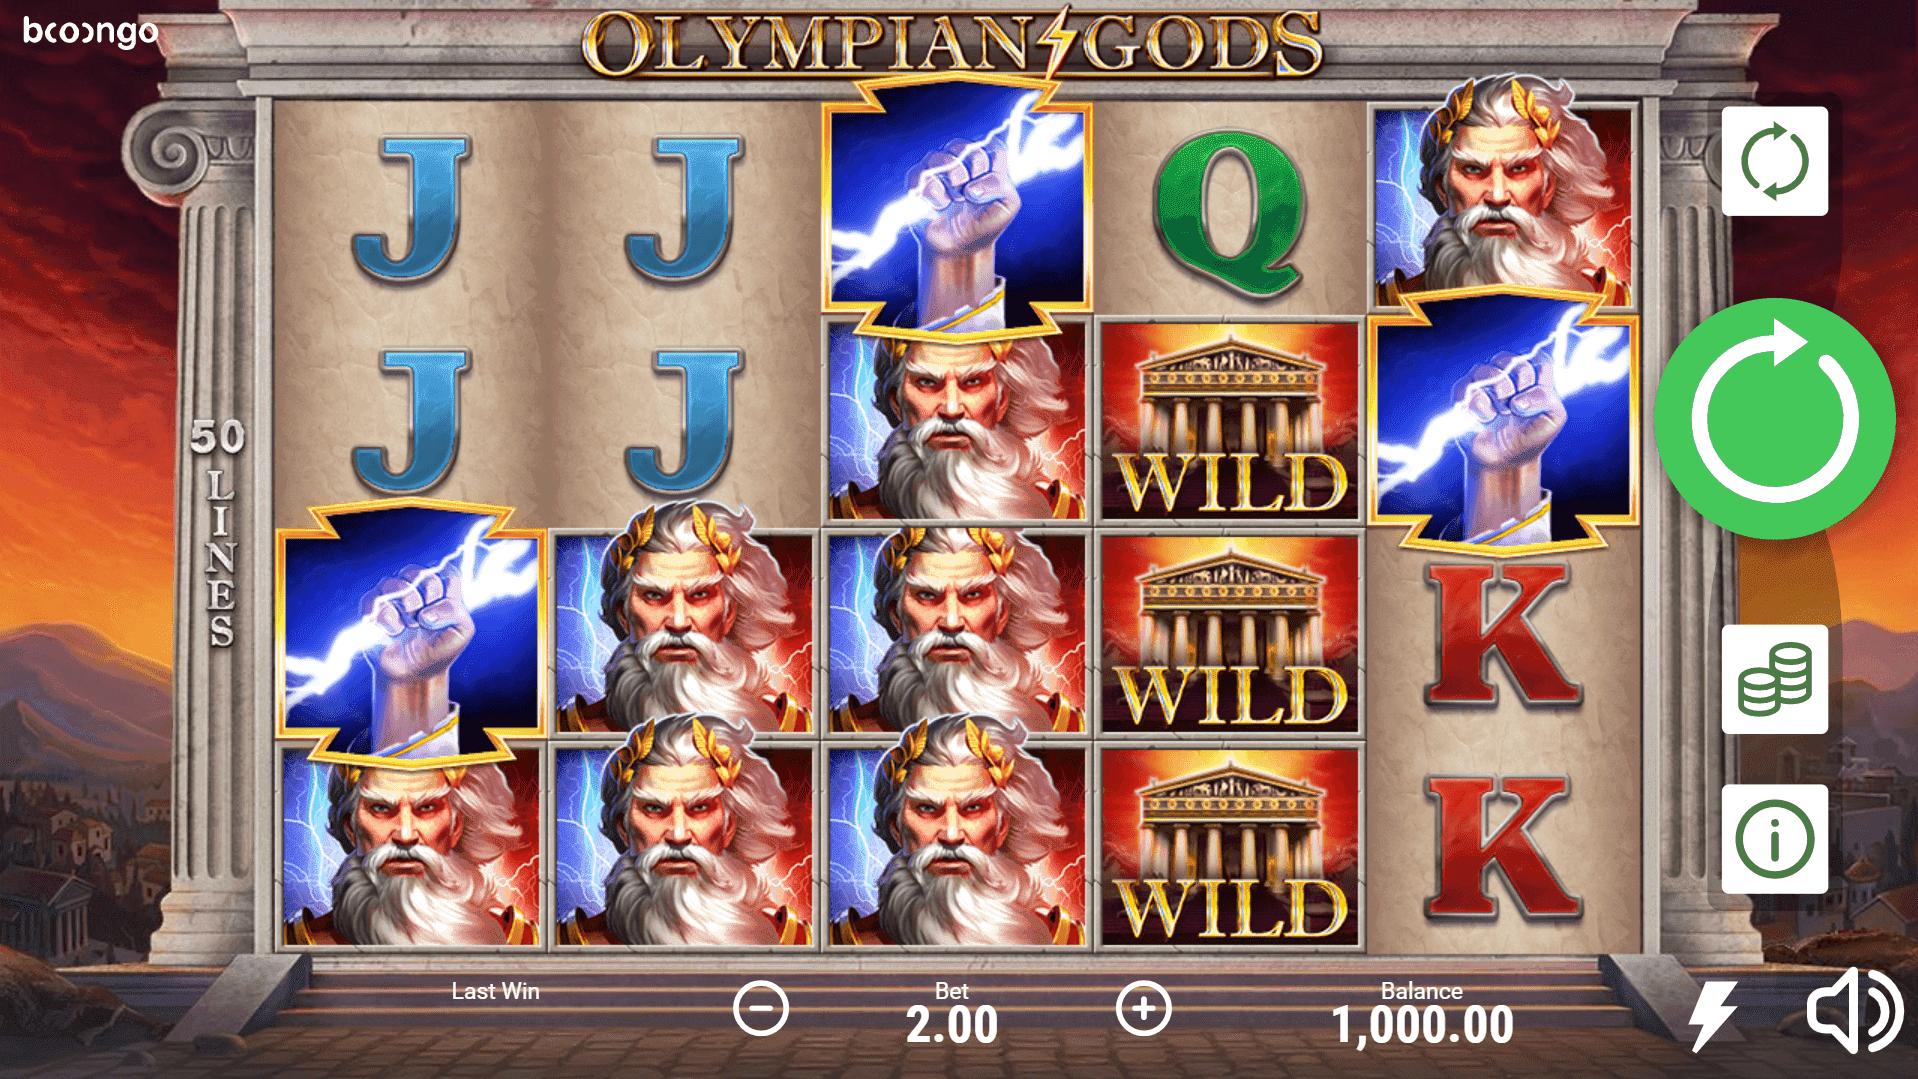 Olympian Gods slot machine screenshot